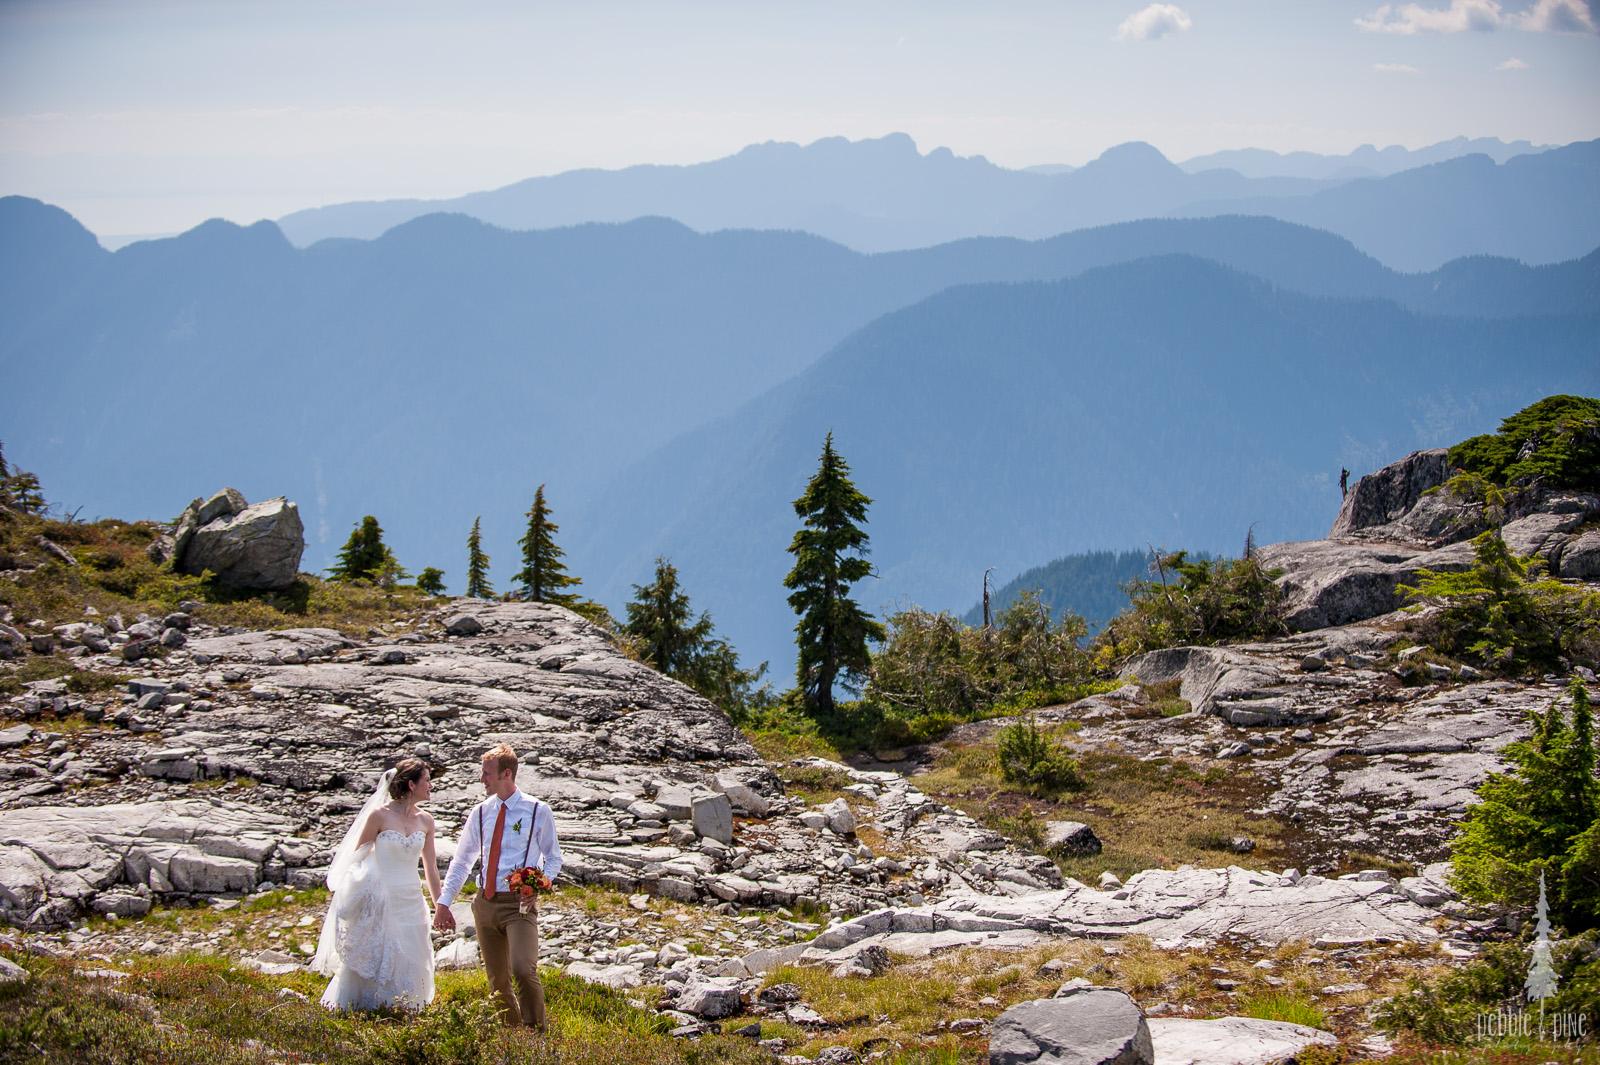 vancouver-island-wedding-photographers-golden-eagle-golf-course-wedding-mountaintop-wedding-33.jpg